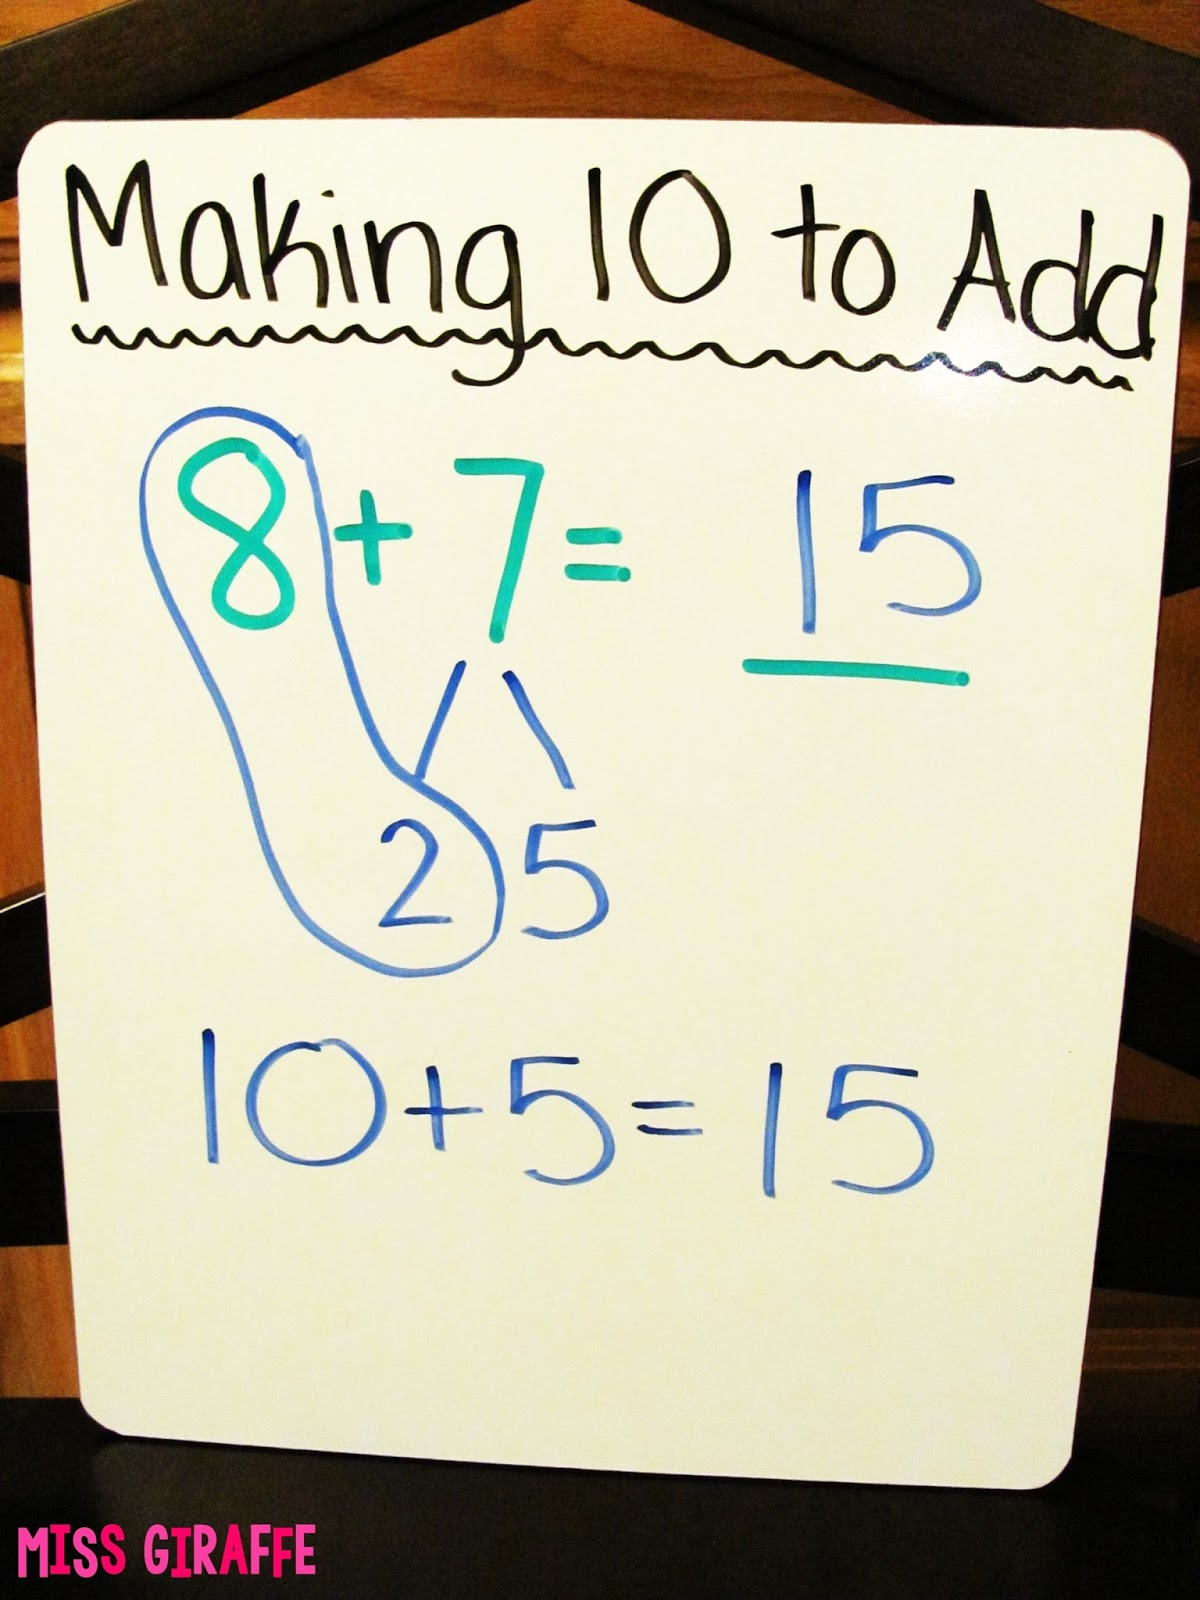 Miss Giraffe's Class: Making a 10 to Add [ 1600 x 1200 Pixel ]